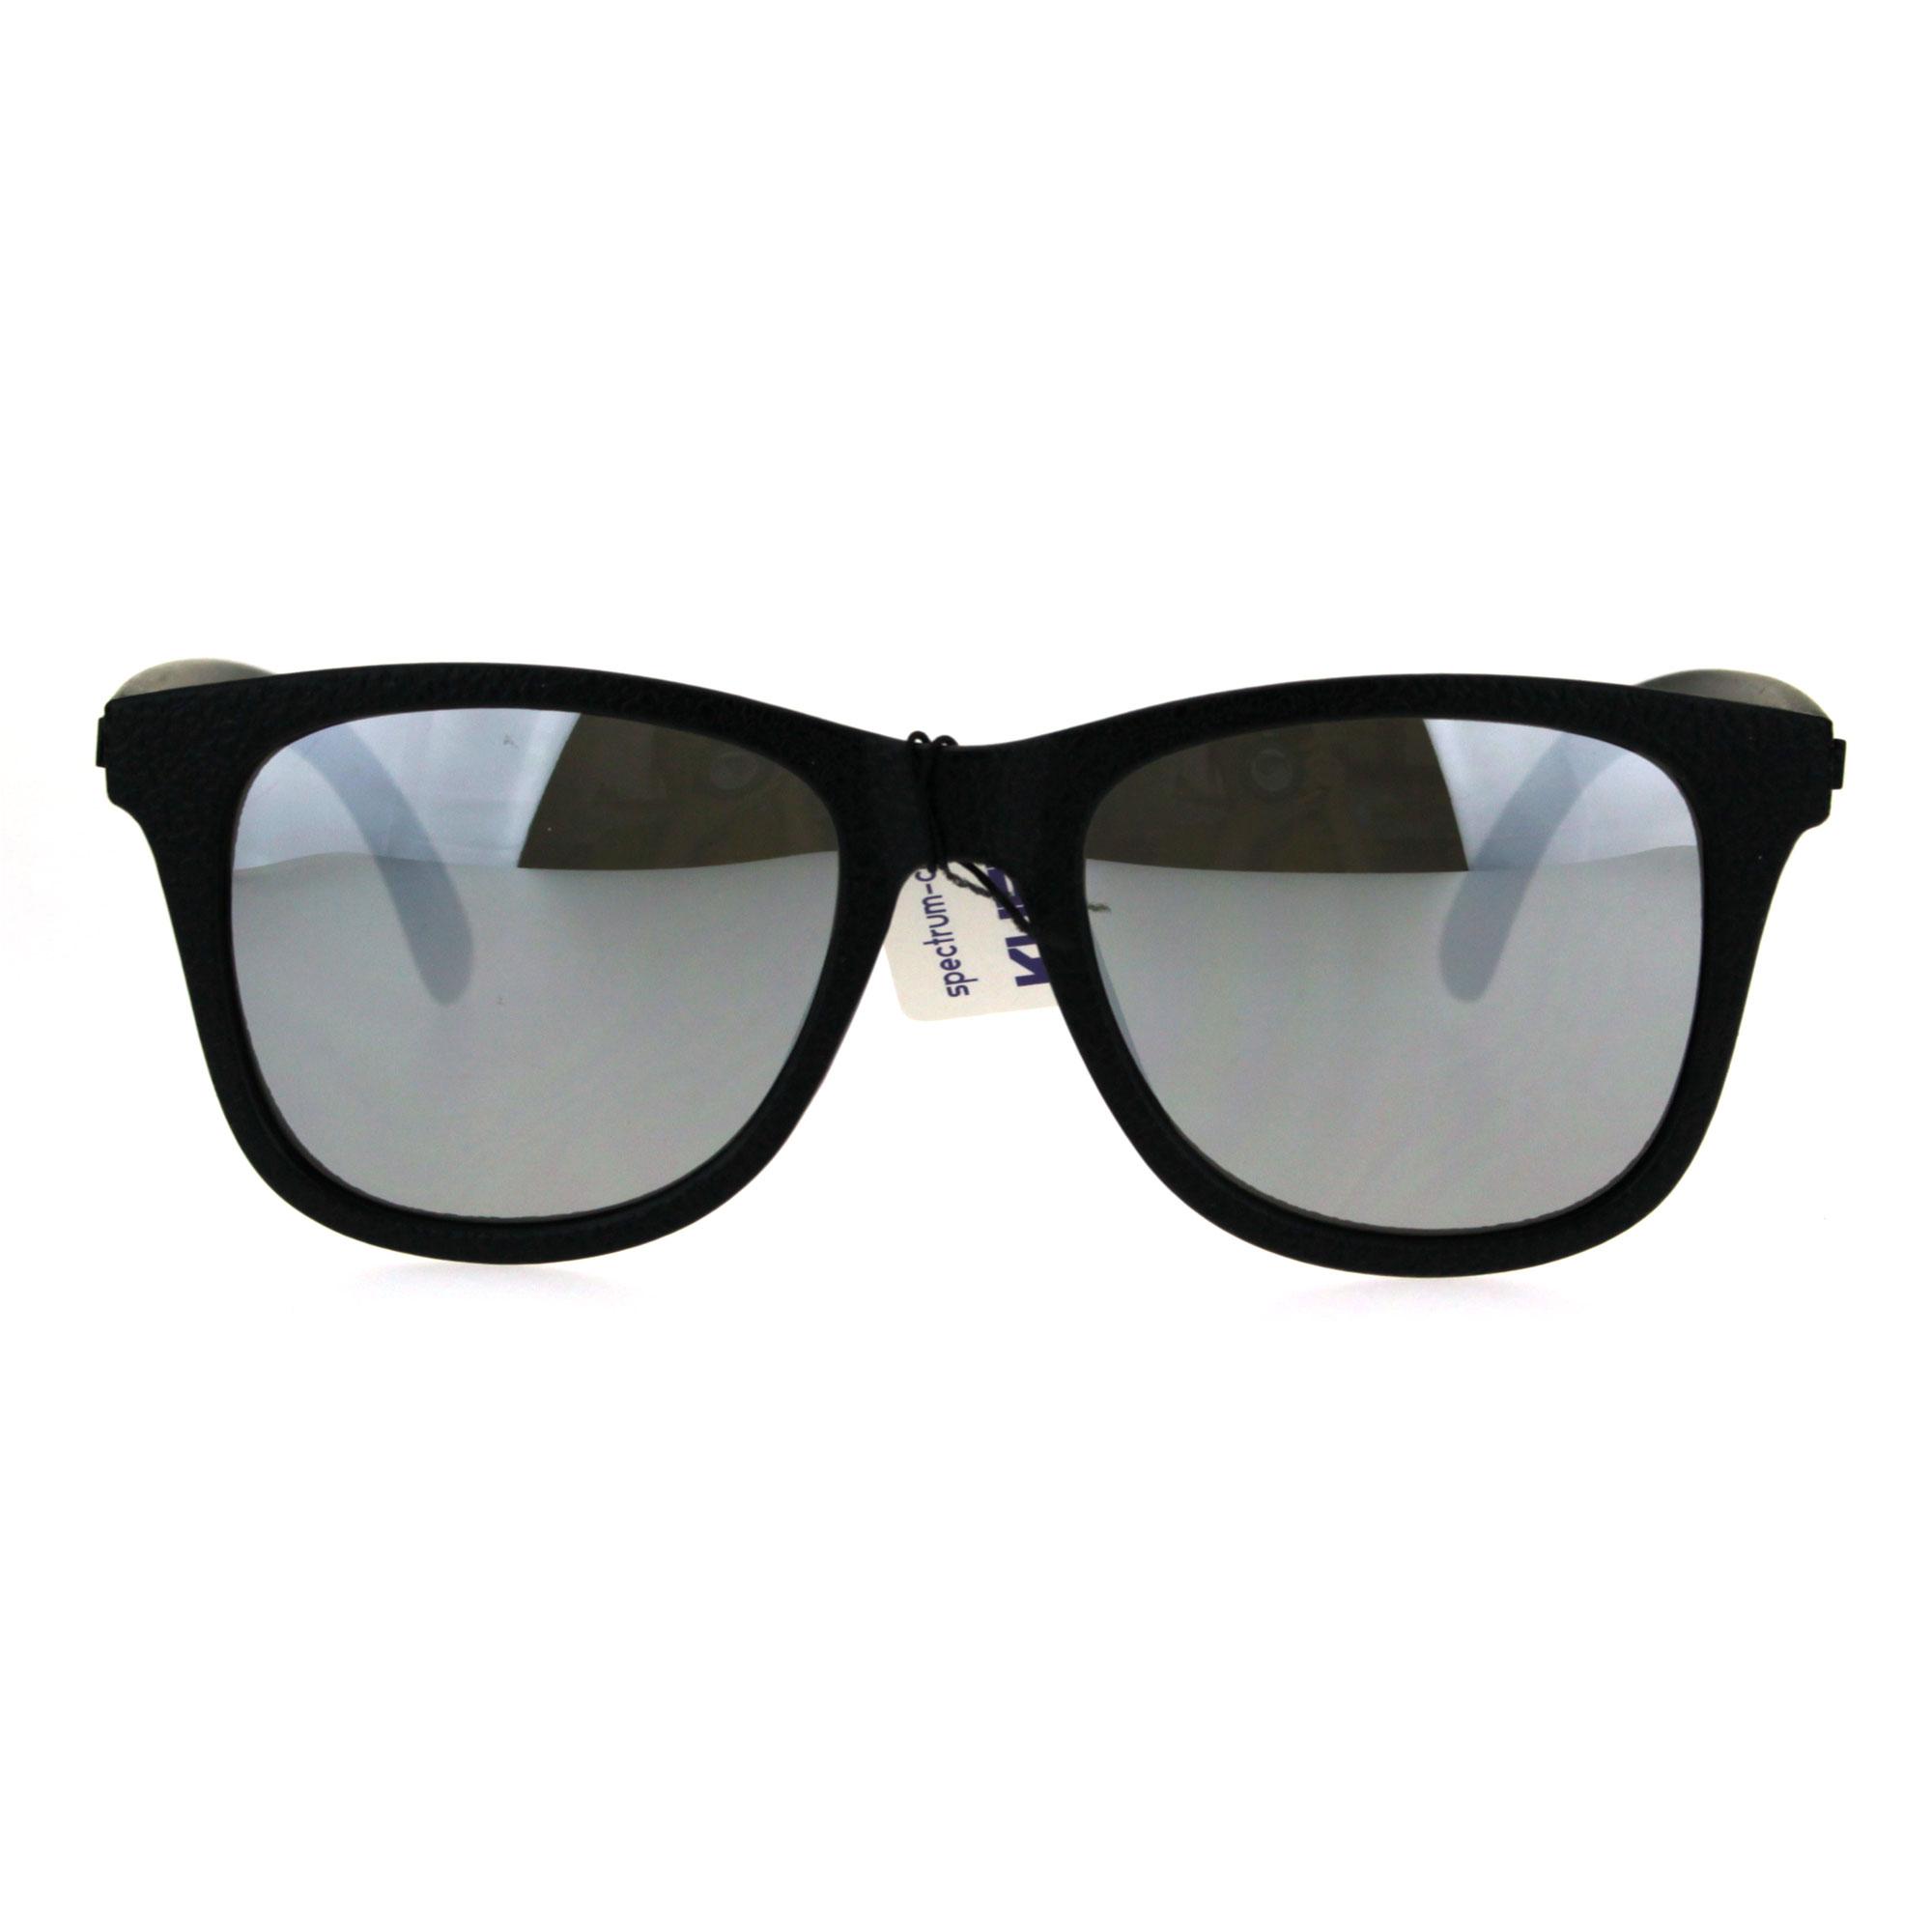 61625252ed22 Black Mirror Sunglasses Mens